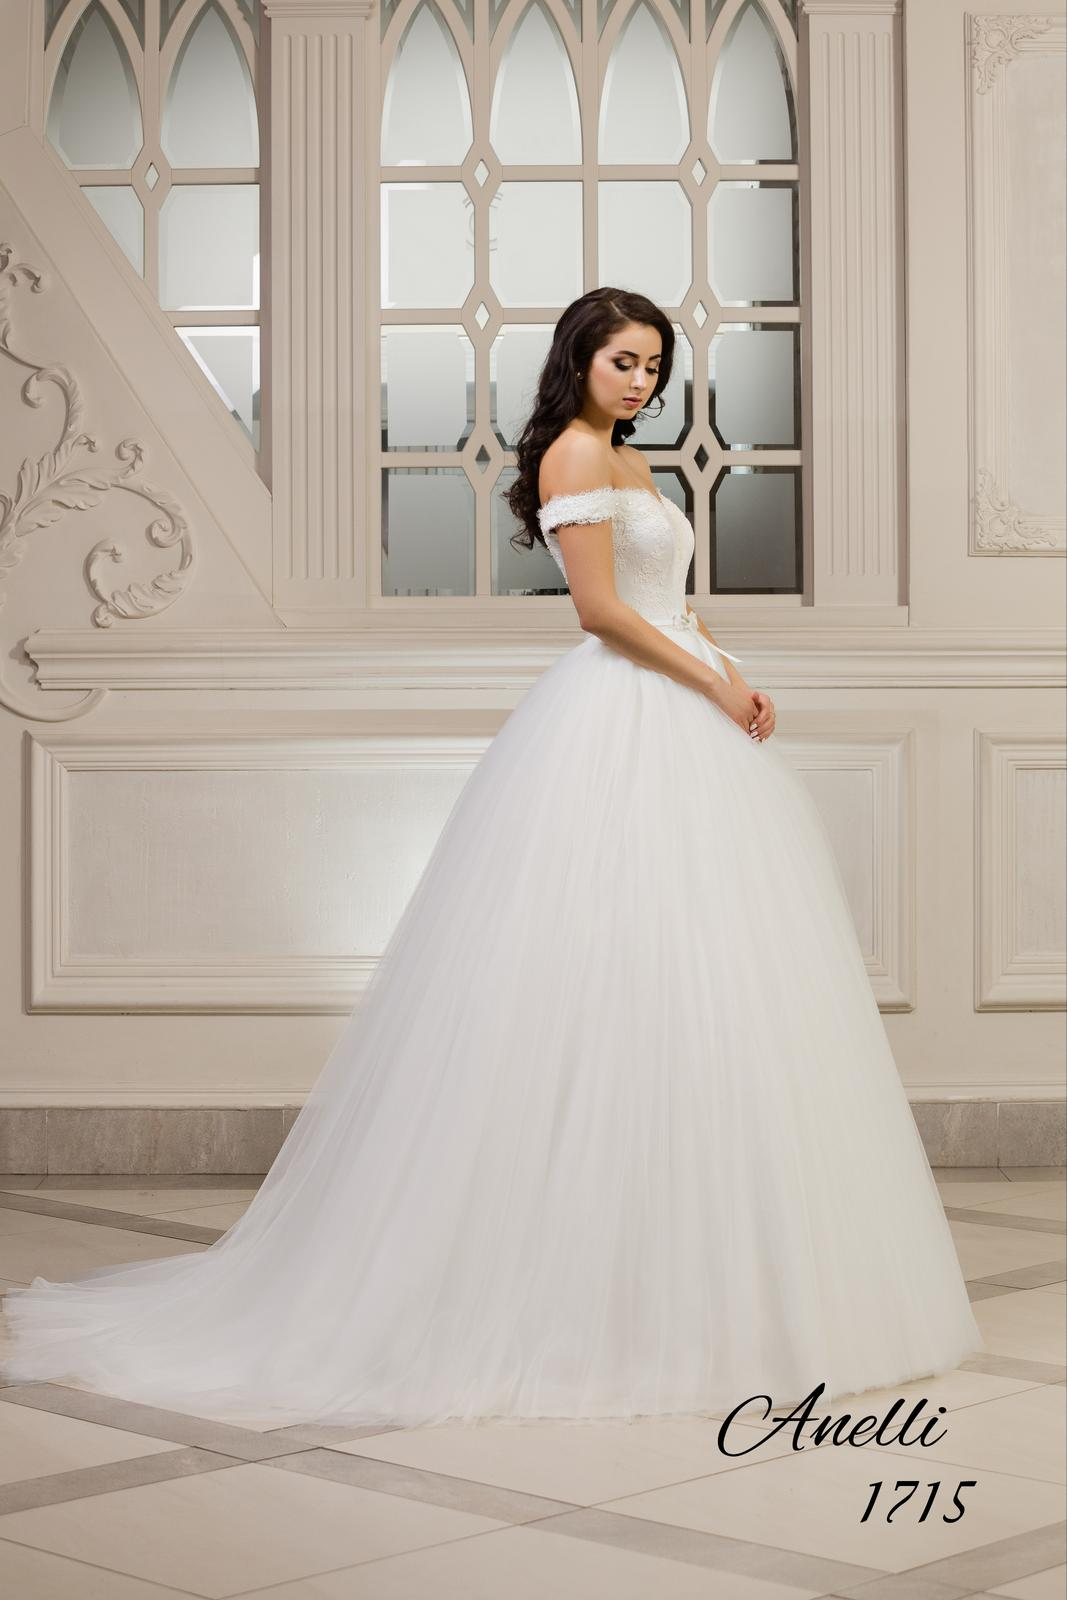 Svadobné šaty - Debut 1715 - Obrázok č. 1